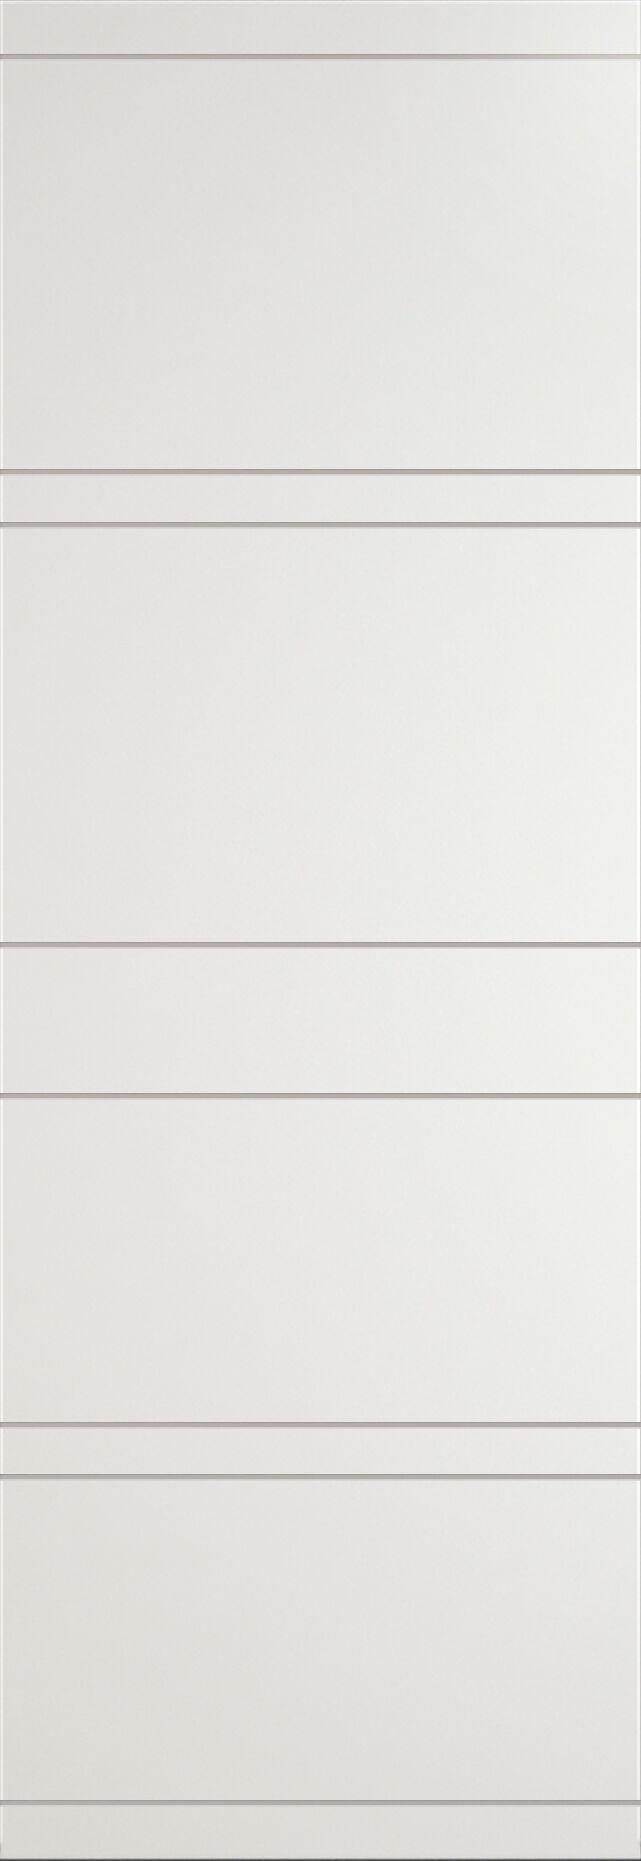 Tivoli Е-2 Invisible цвет - Бежевая эмаль Без стекла (ДГ)